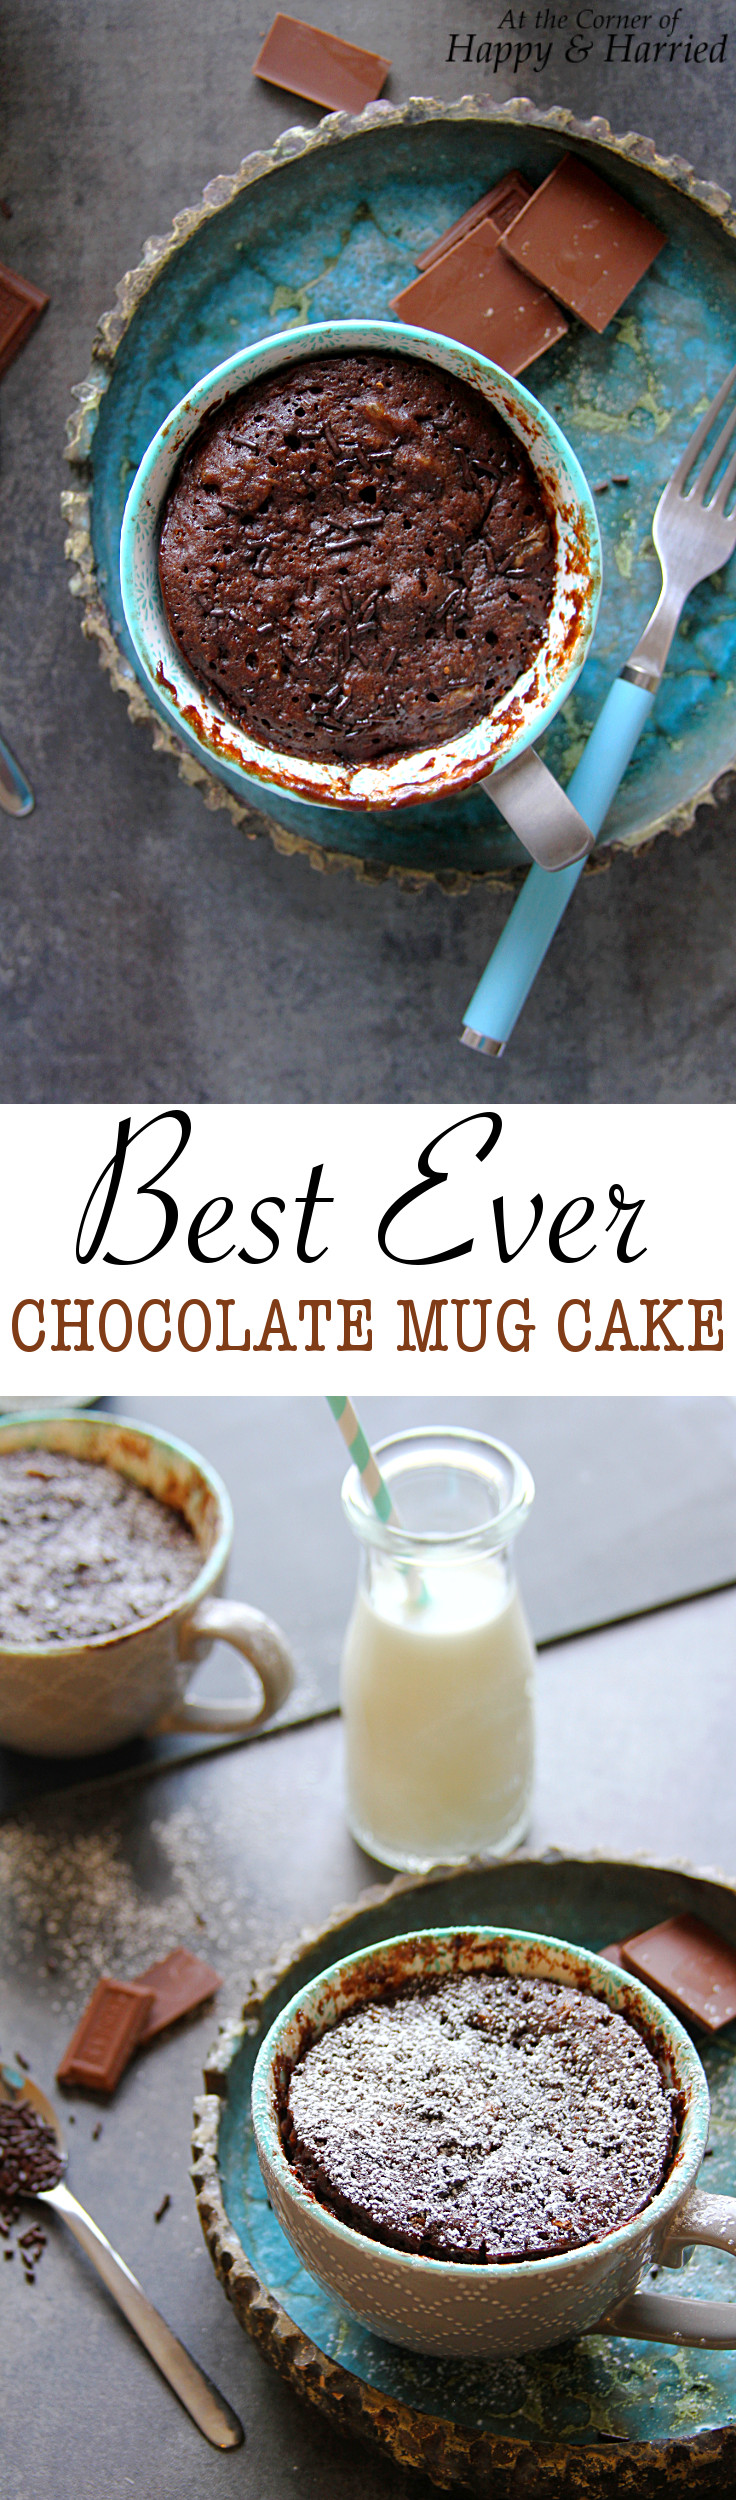 BEST EVER CHOCOLATE MUG CAKE - HAPPY&HARRIED